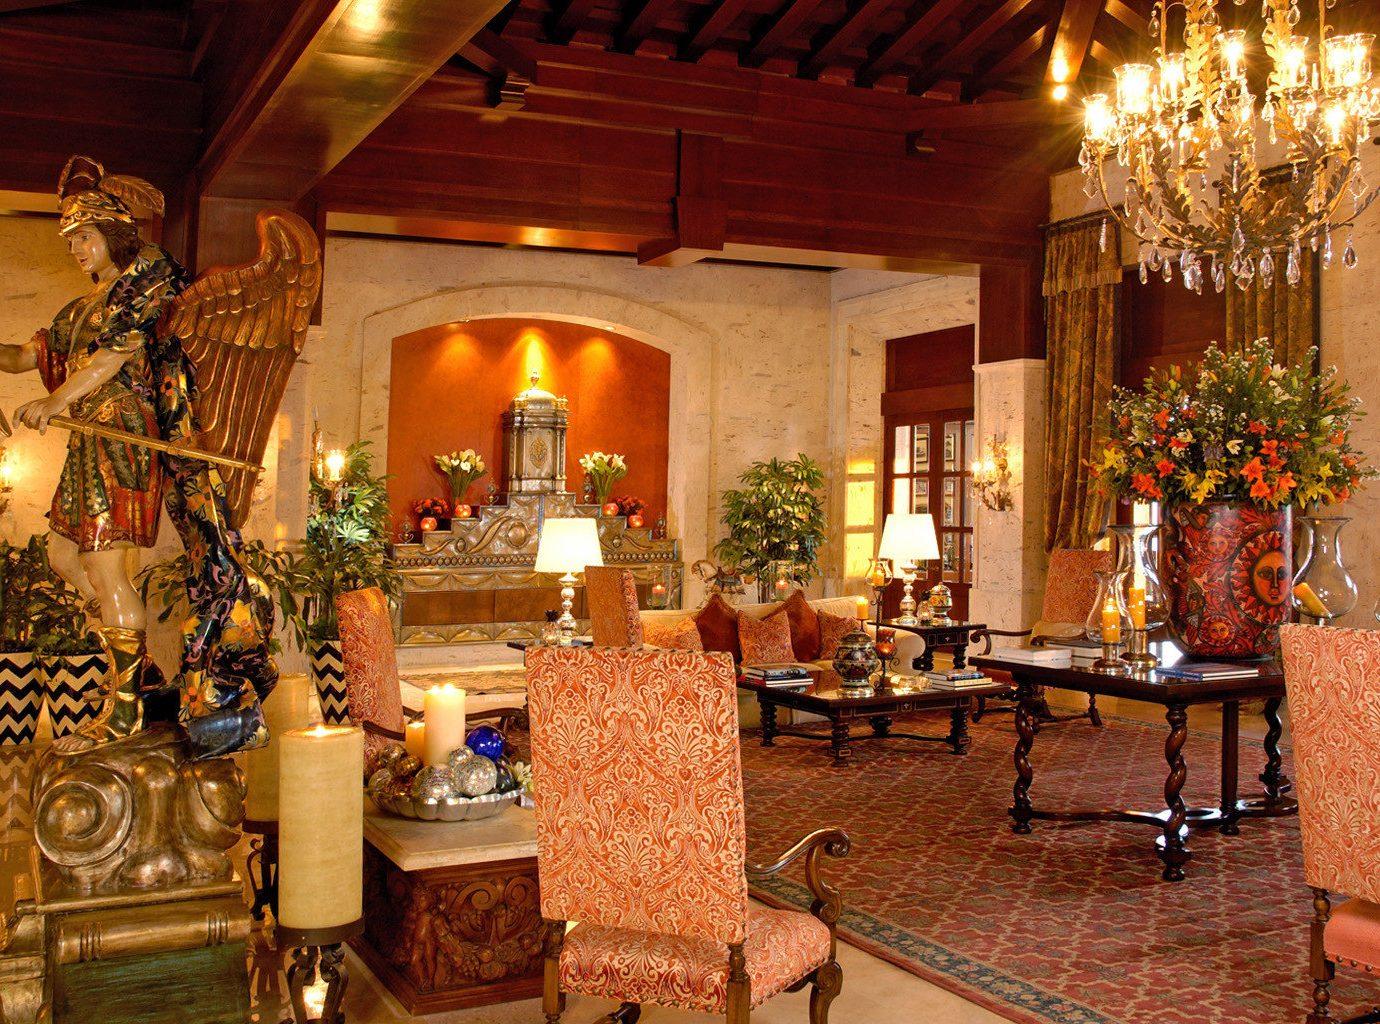 All-inclusive Elegant Family Lobby Resort Tropical building palace restaurant home hacienda function hall mansion ballroom living room